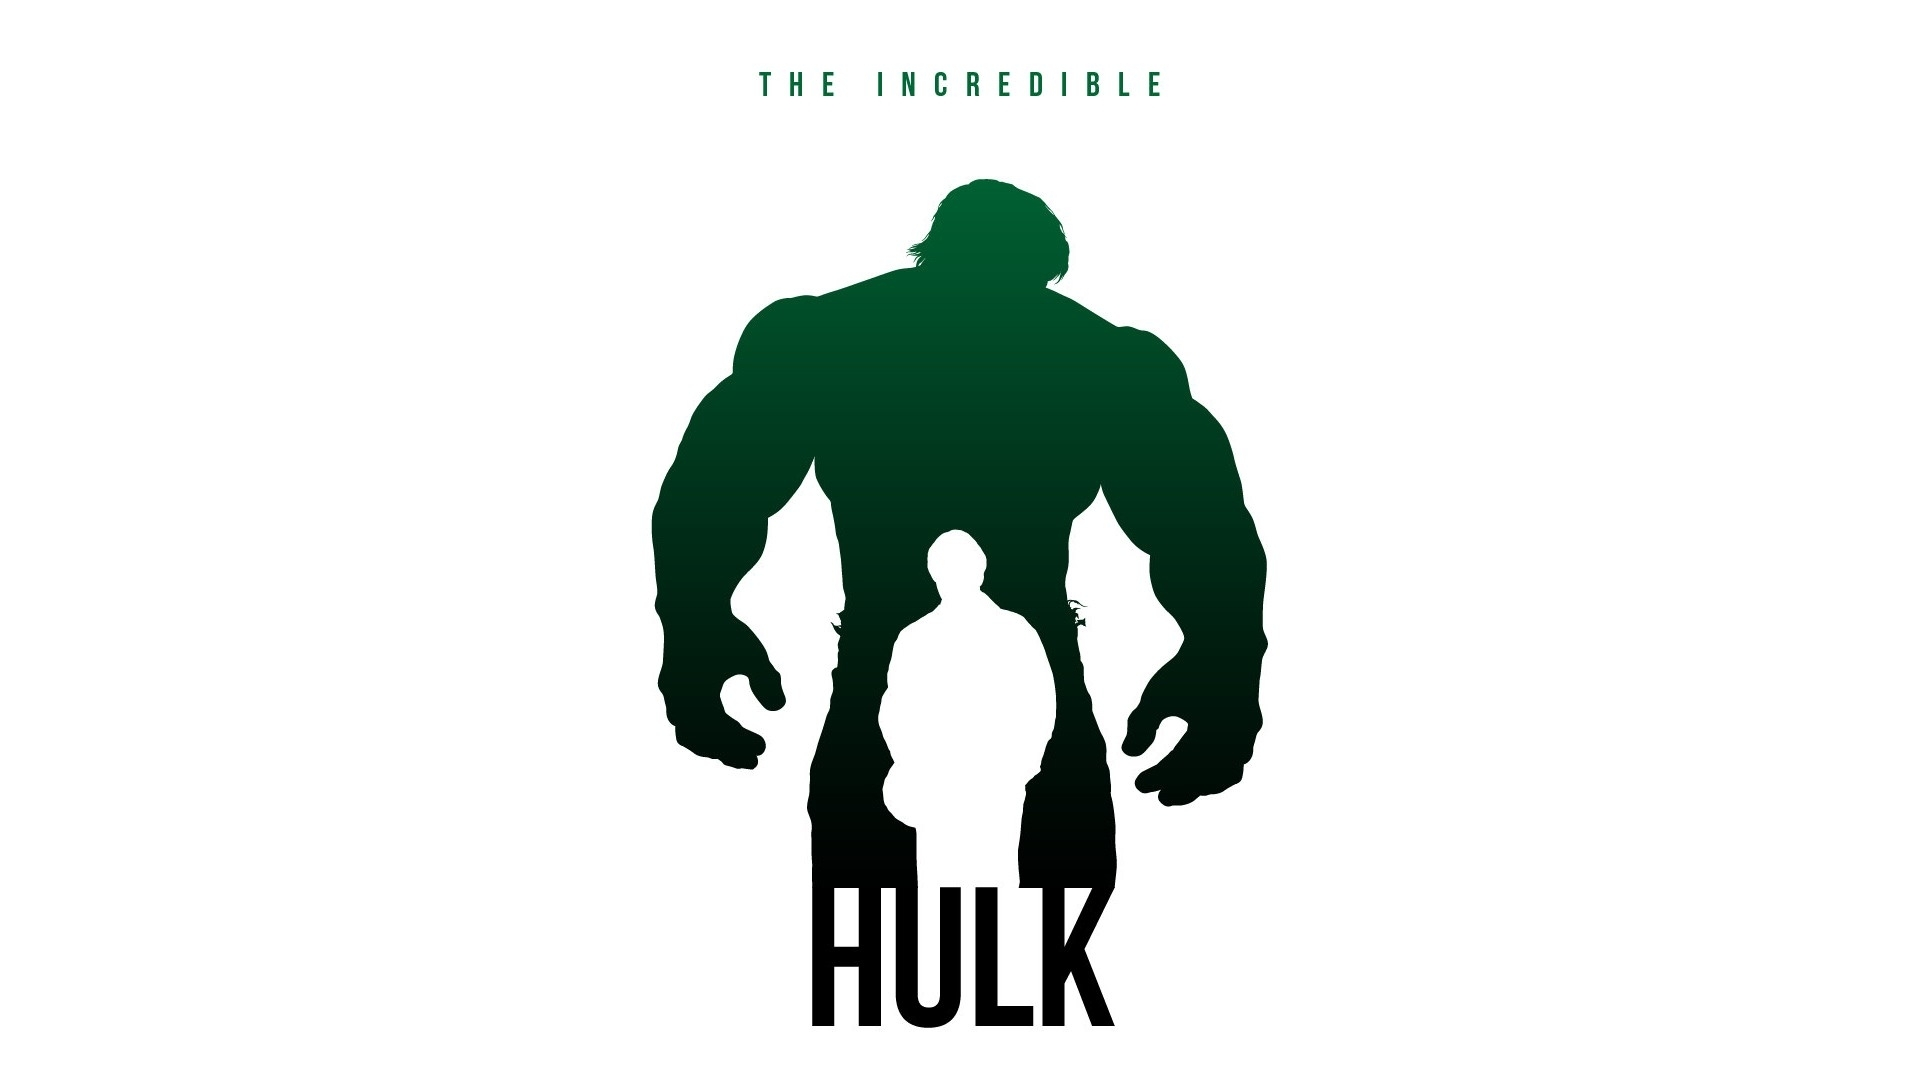 Hulk clip art clipart.